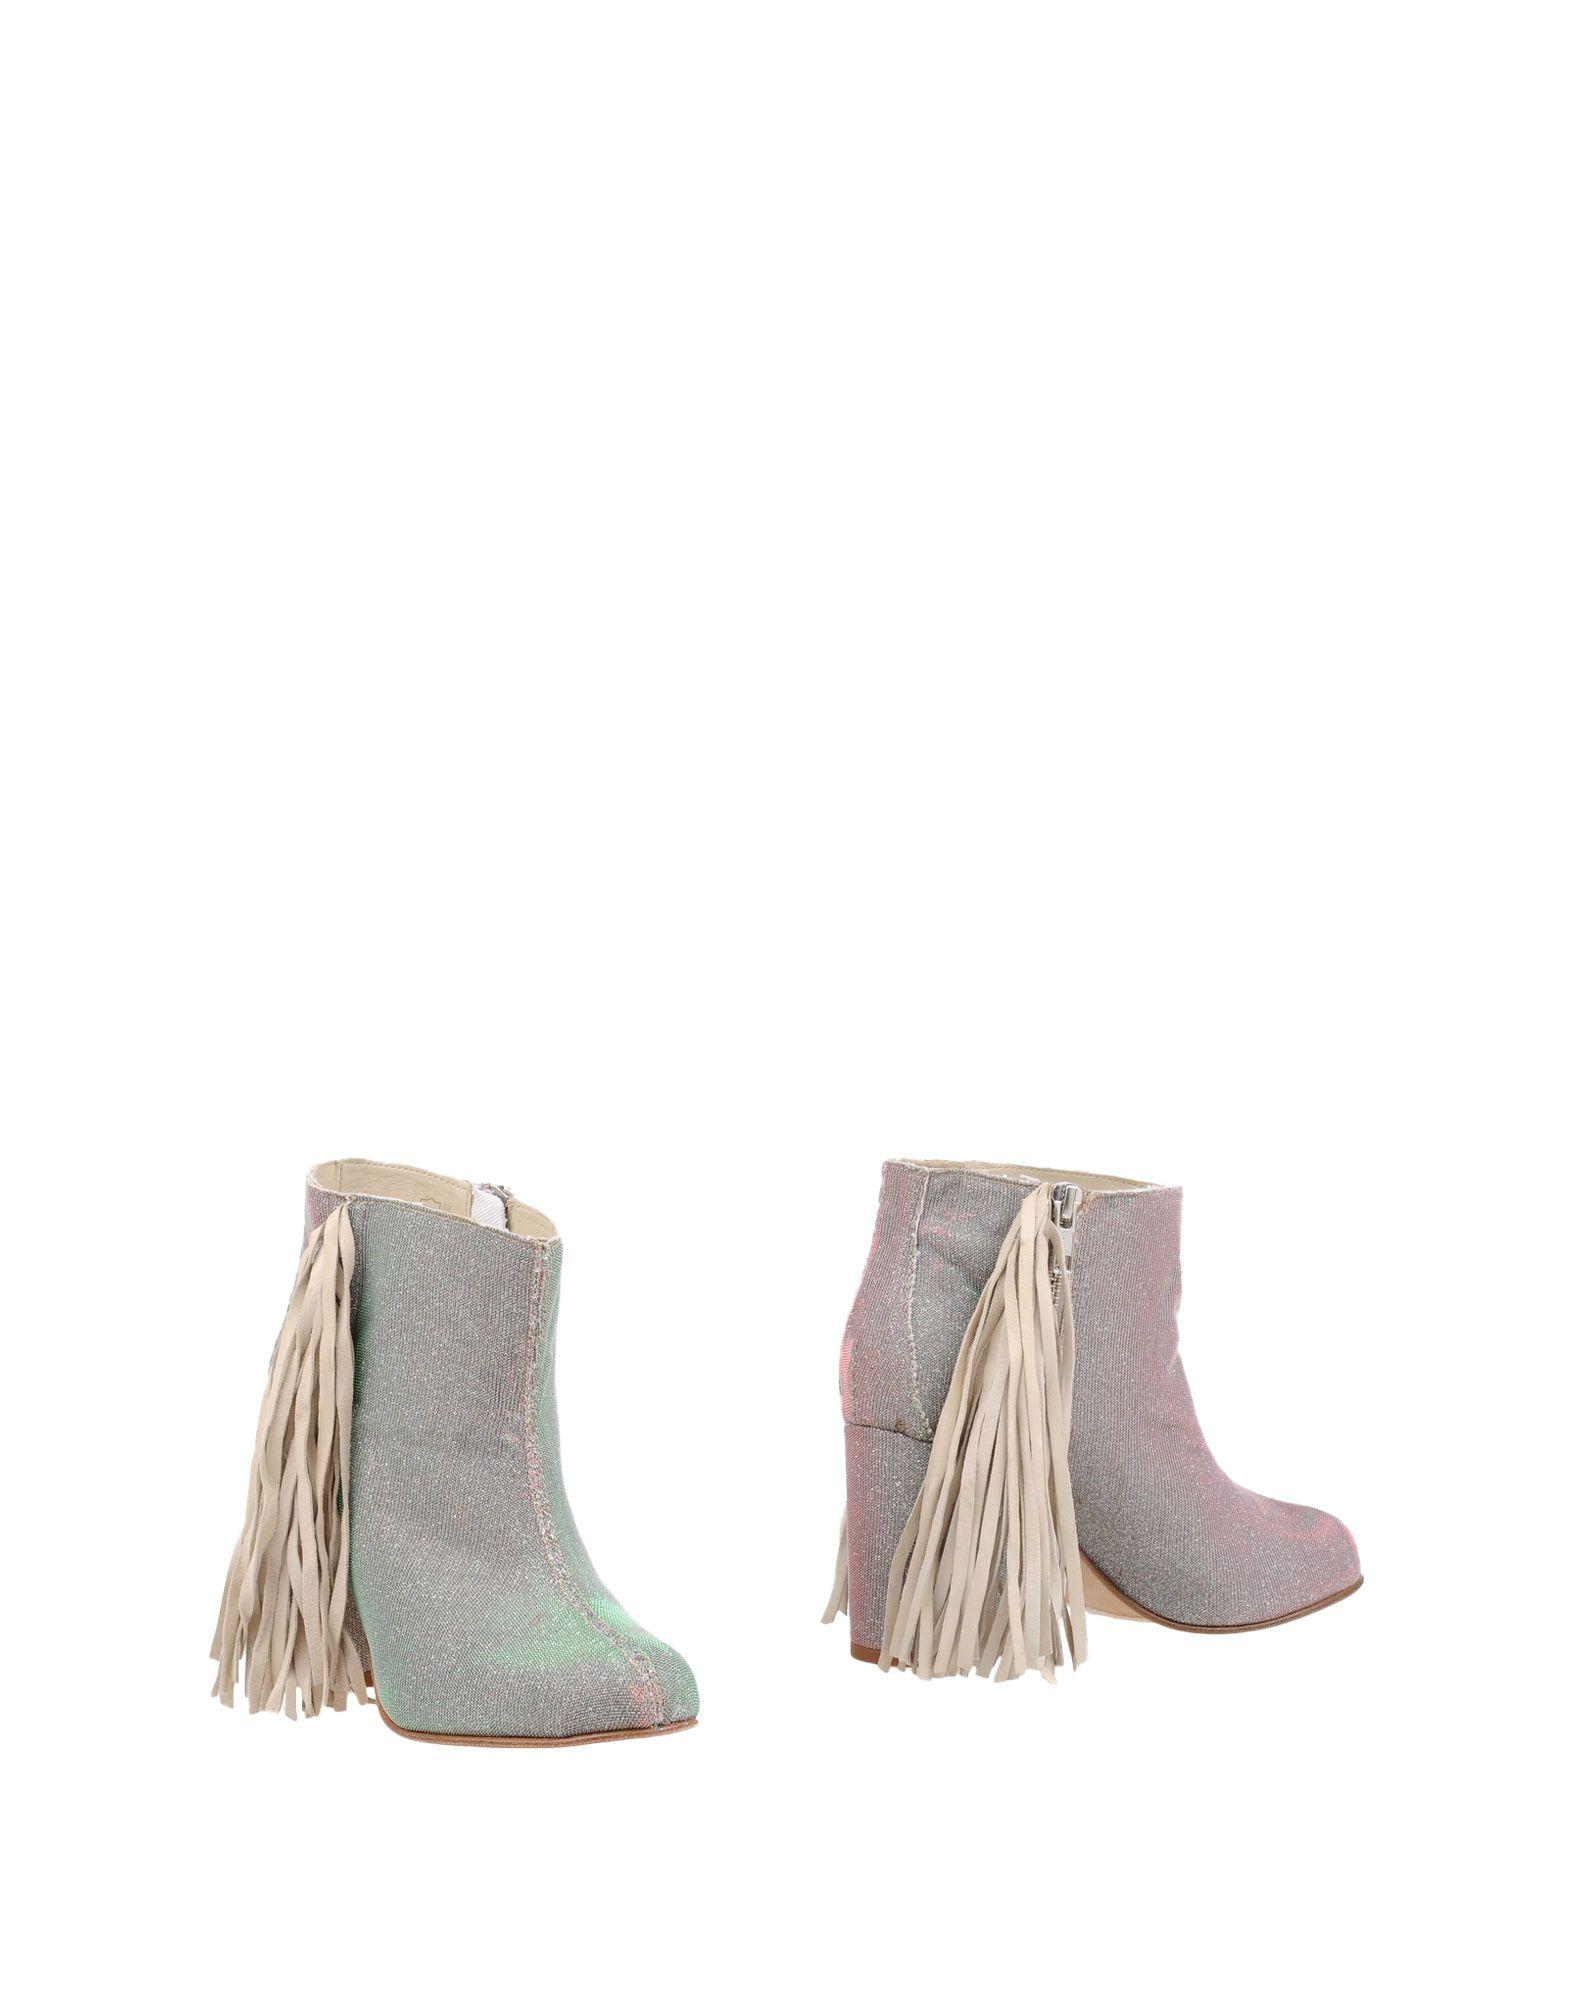 Ouigal Stiefelette Damen  11363966KJ Gute Qualität beliebte Schuhe